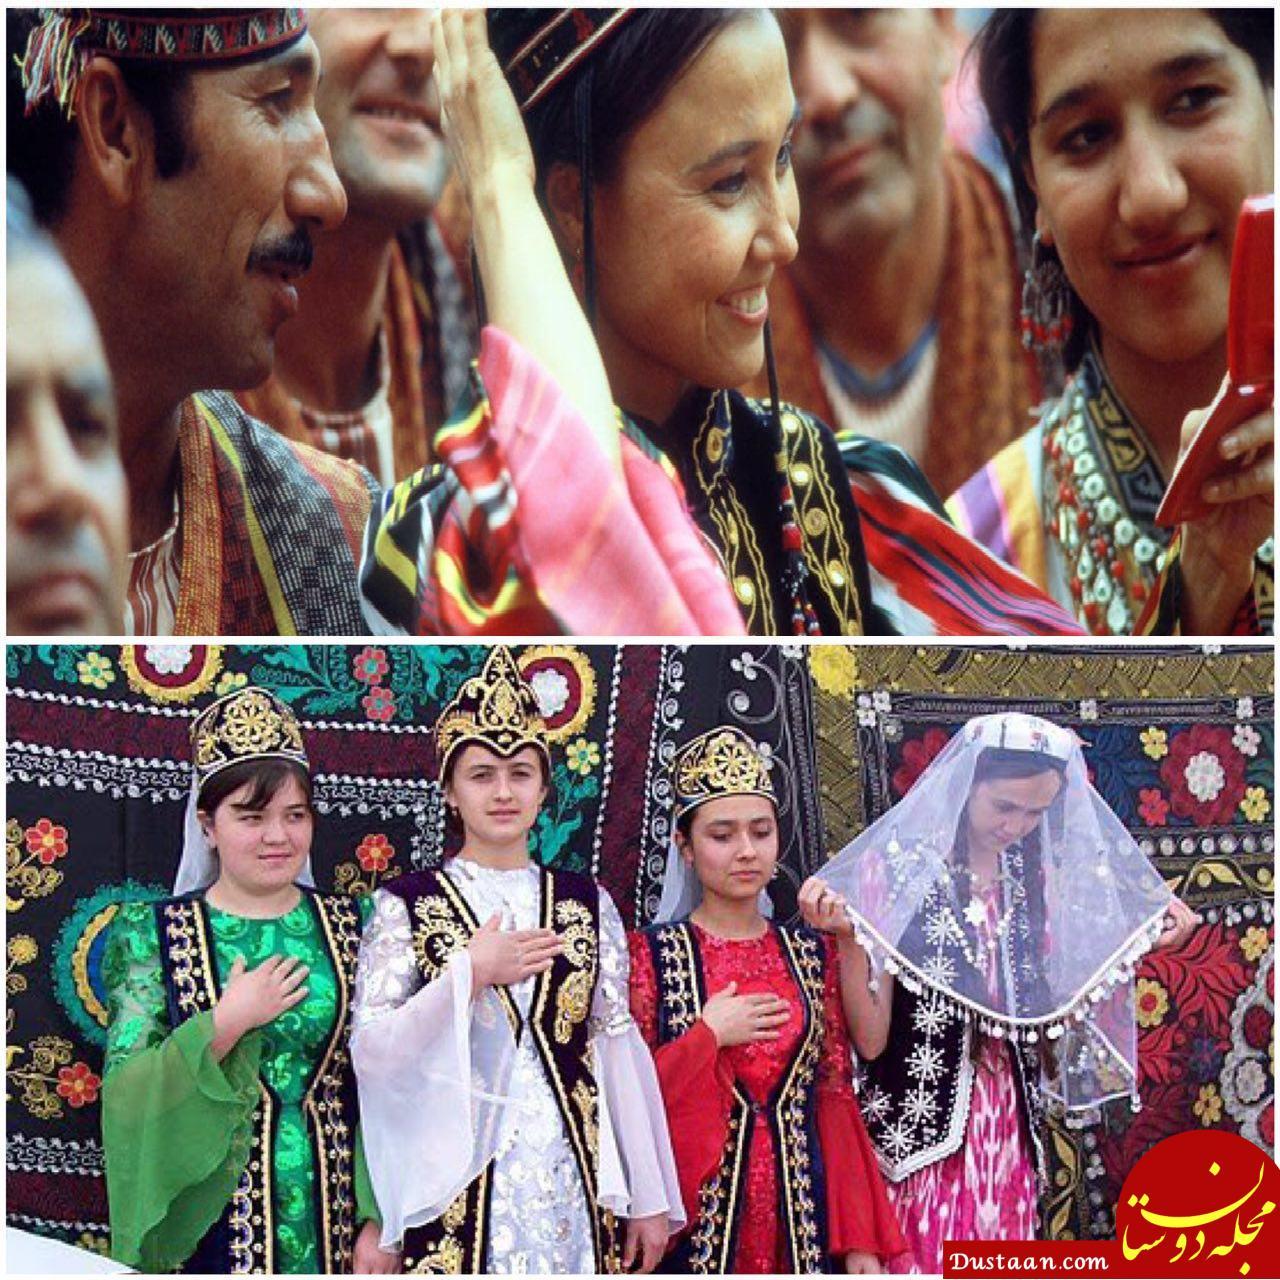 www.dustaan.com عجیب ترین روش طلاق در تاجیکستان/ طلاق همسر به وسیله تلفن! +عکس